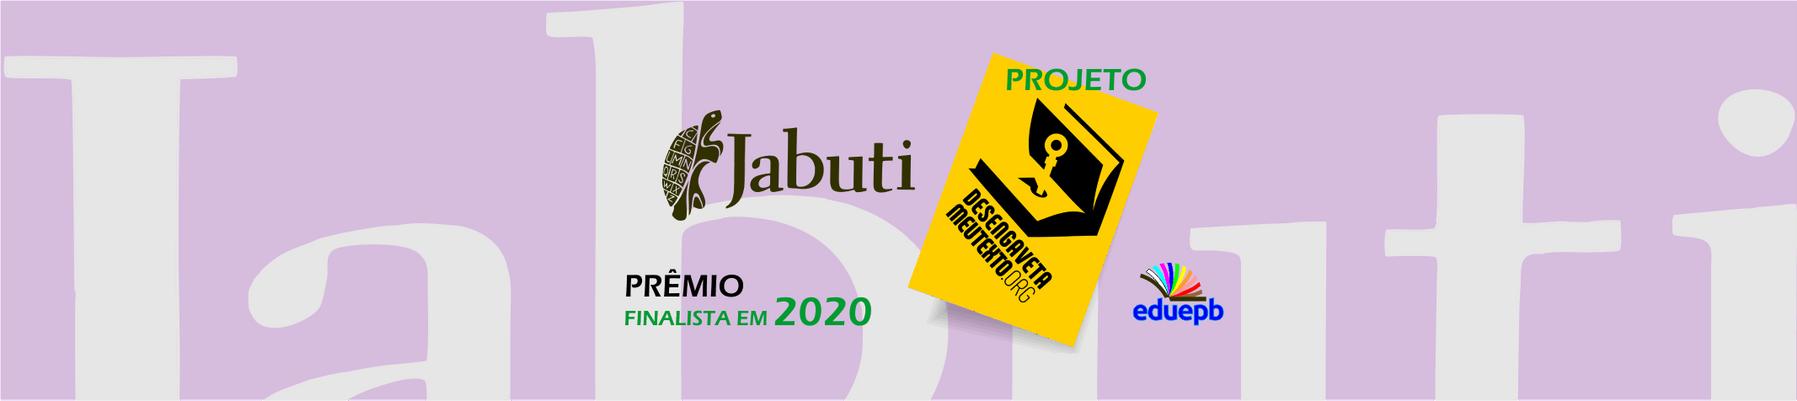 JABUTI 8.png